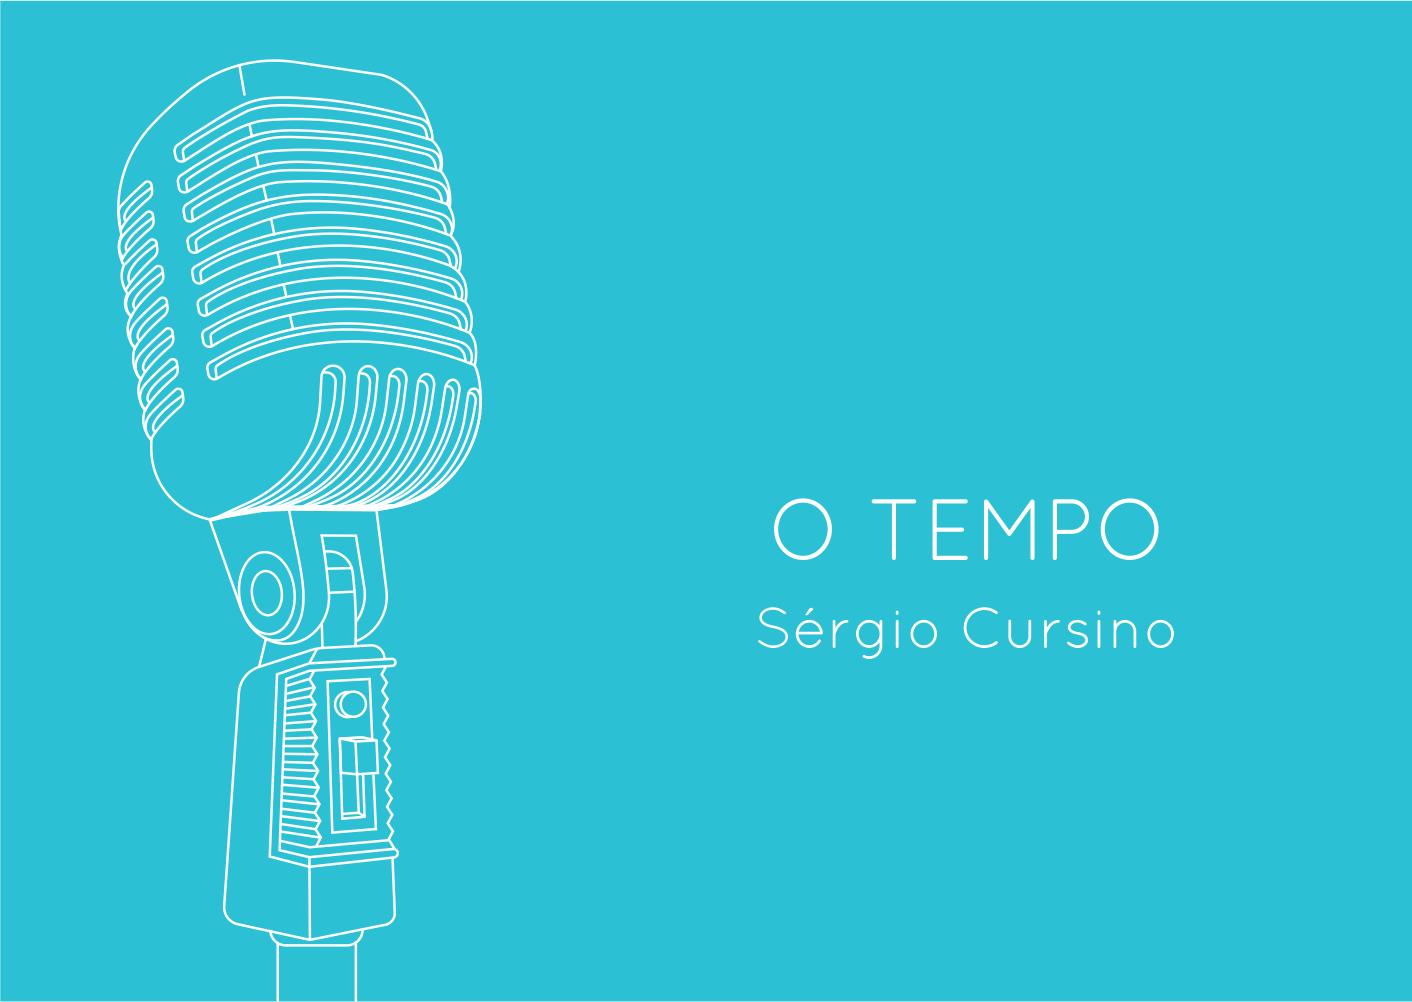 O Tempo Sérgio Cursino